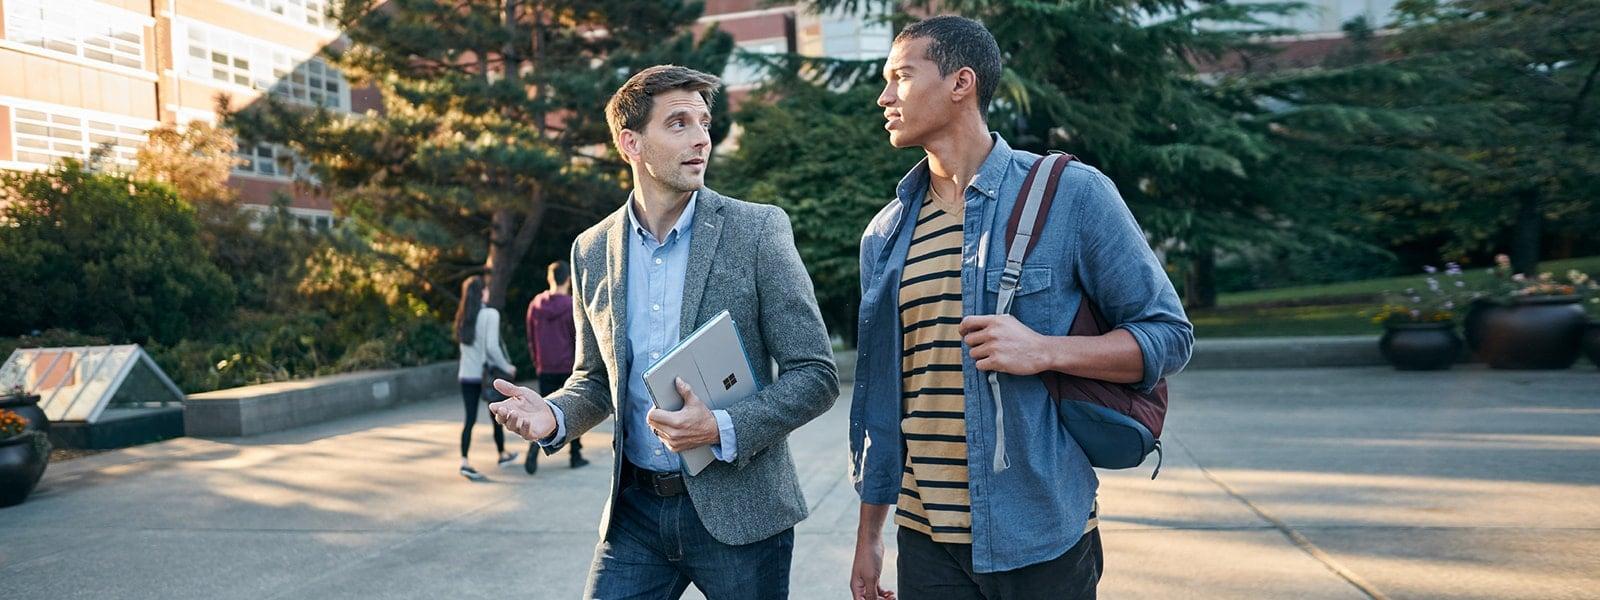 Profesor con estudiantes que transportan dispositivos de Microsoft